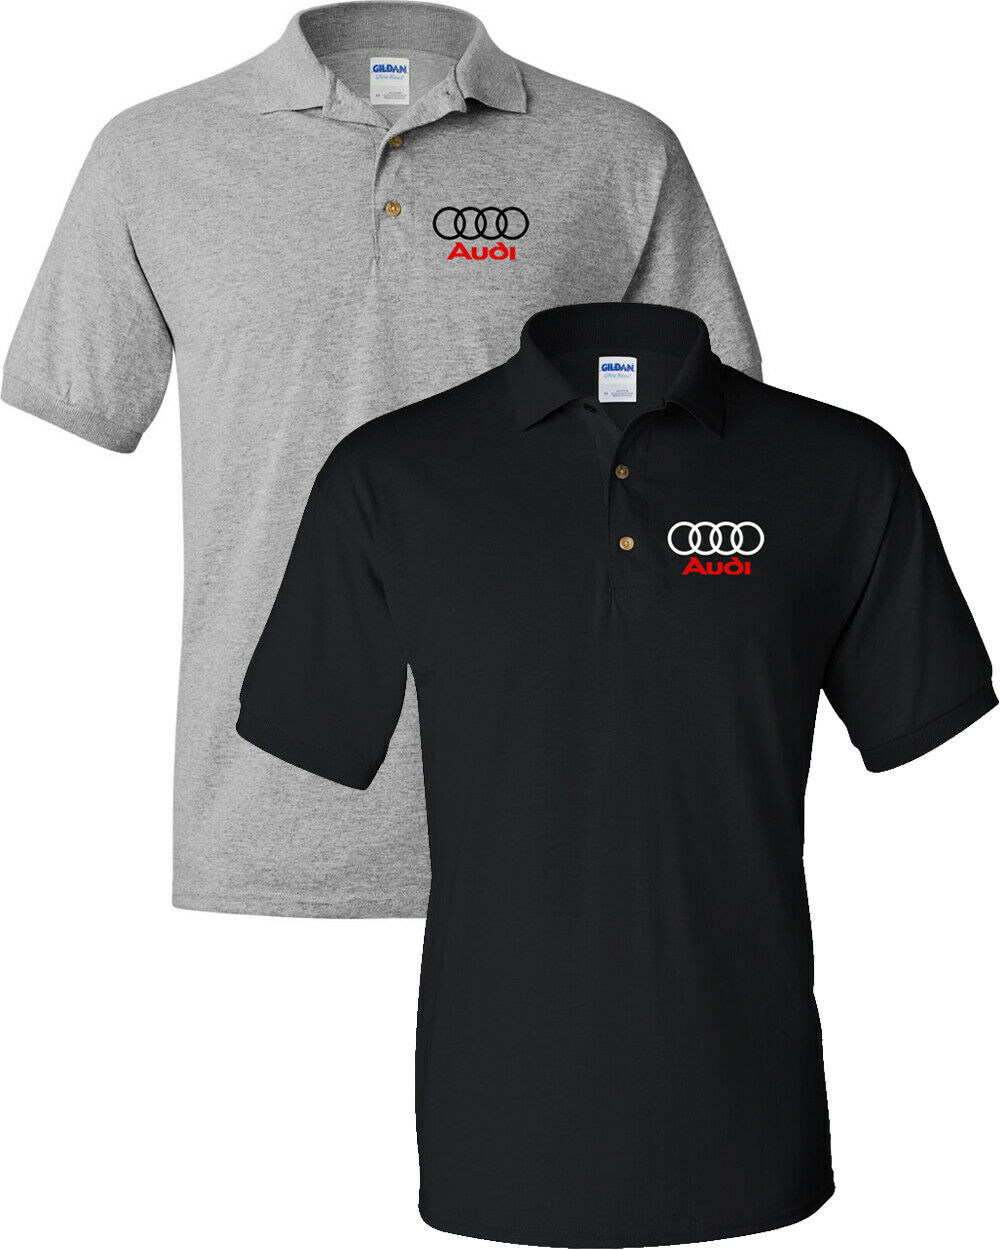 Audi rings Logo Shirt Audi Men's Polo Shirt